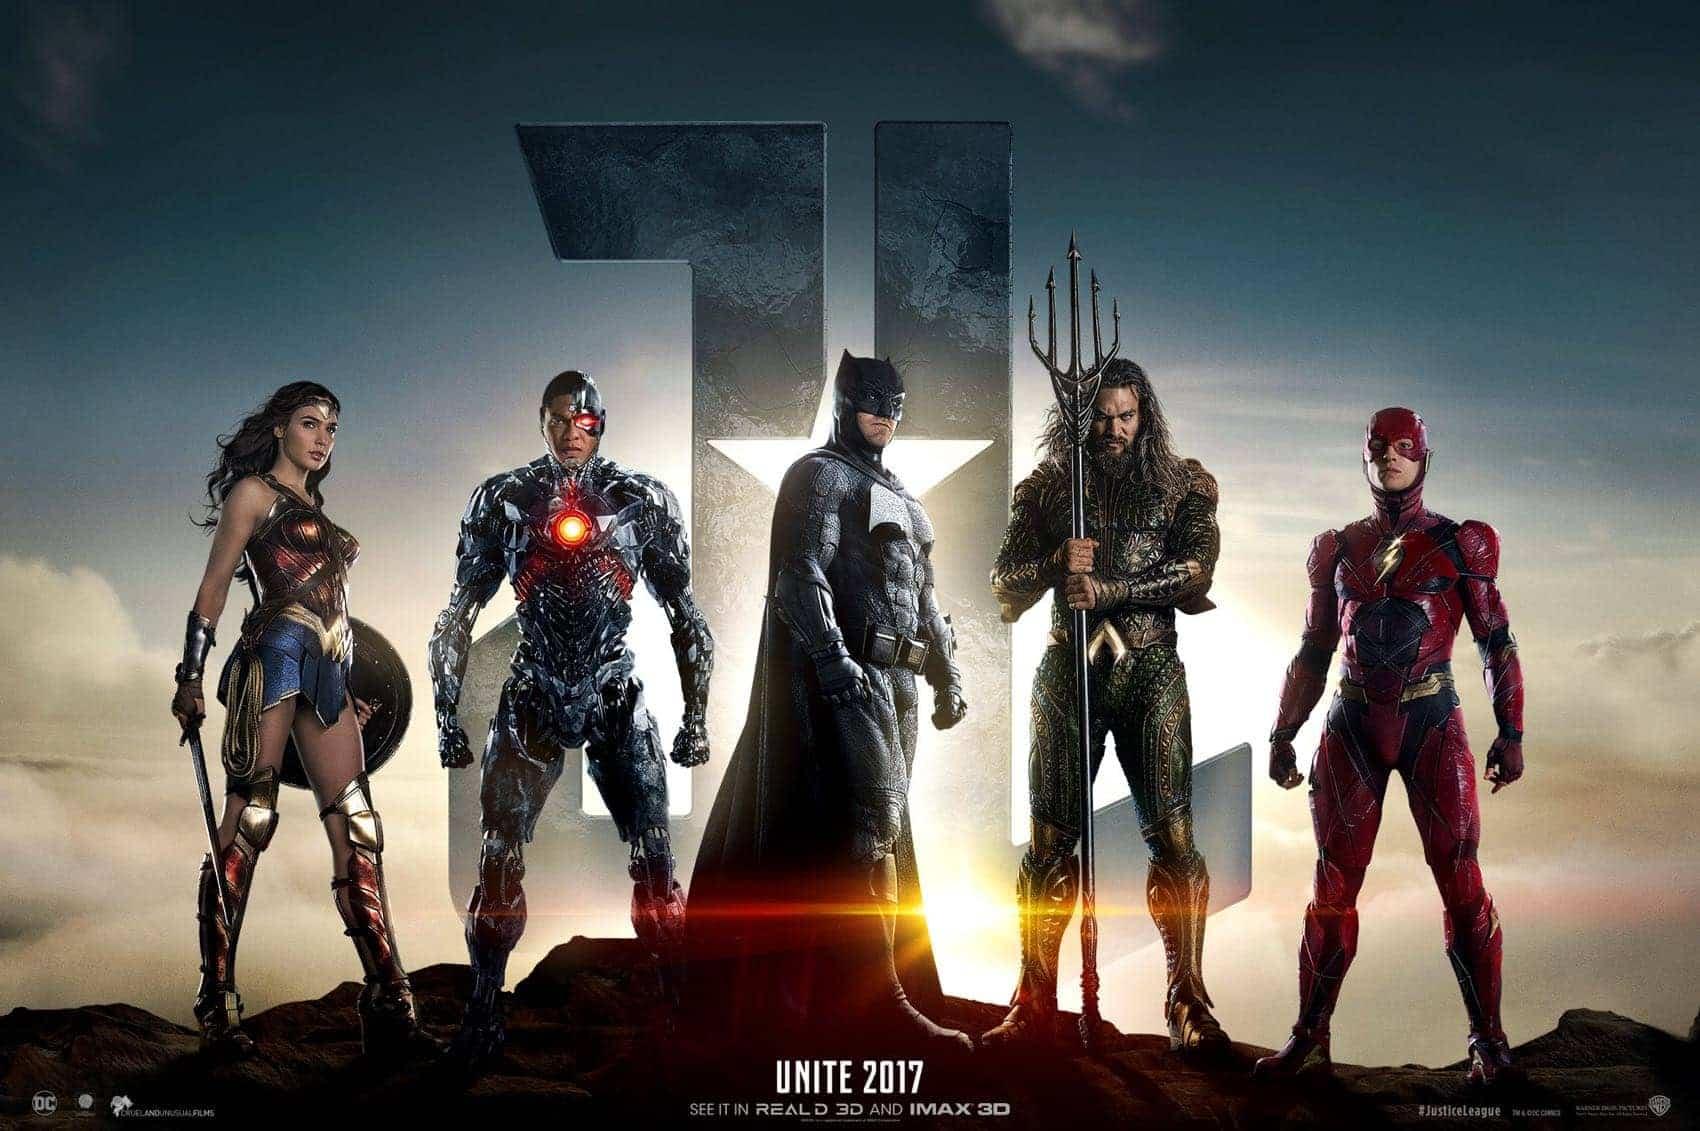 Justice-League-Poster-Batman-Wonder-Woman-Aquaman-Cyborg-The-Flash